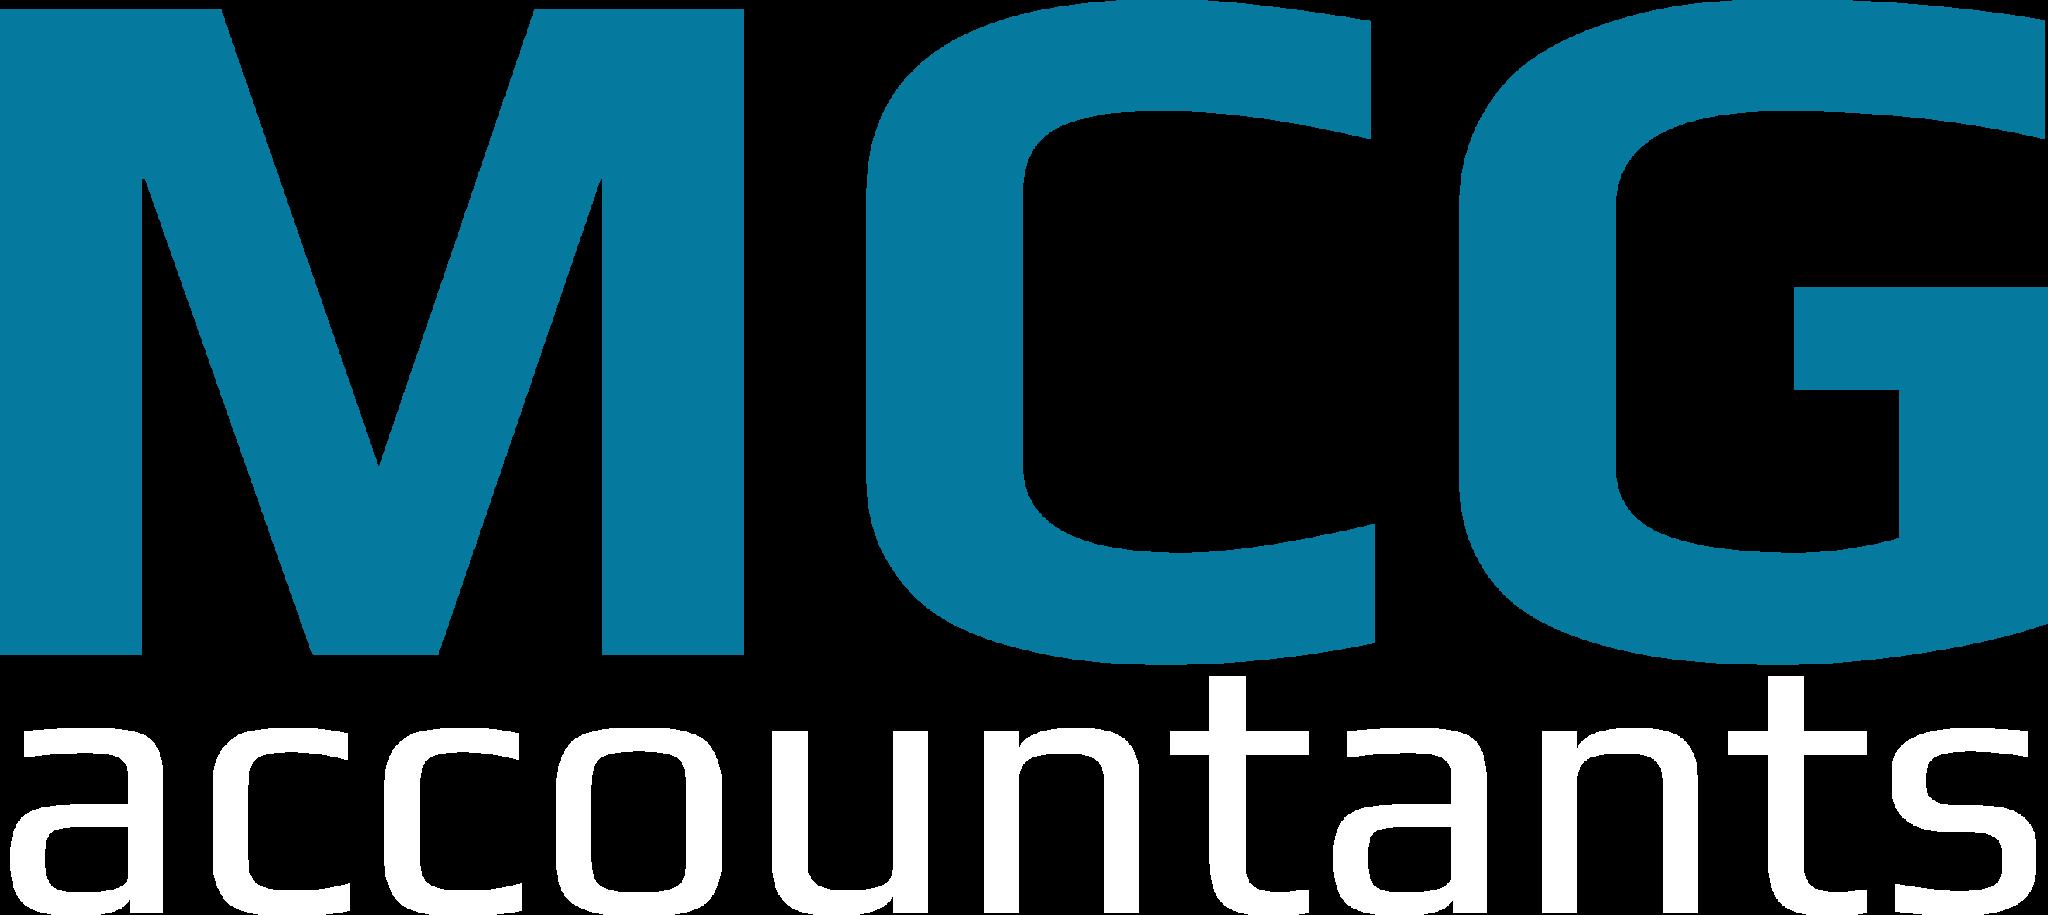 mcgaccountants.com.au Logo